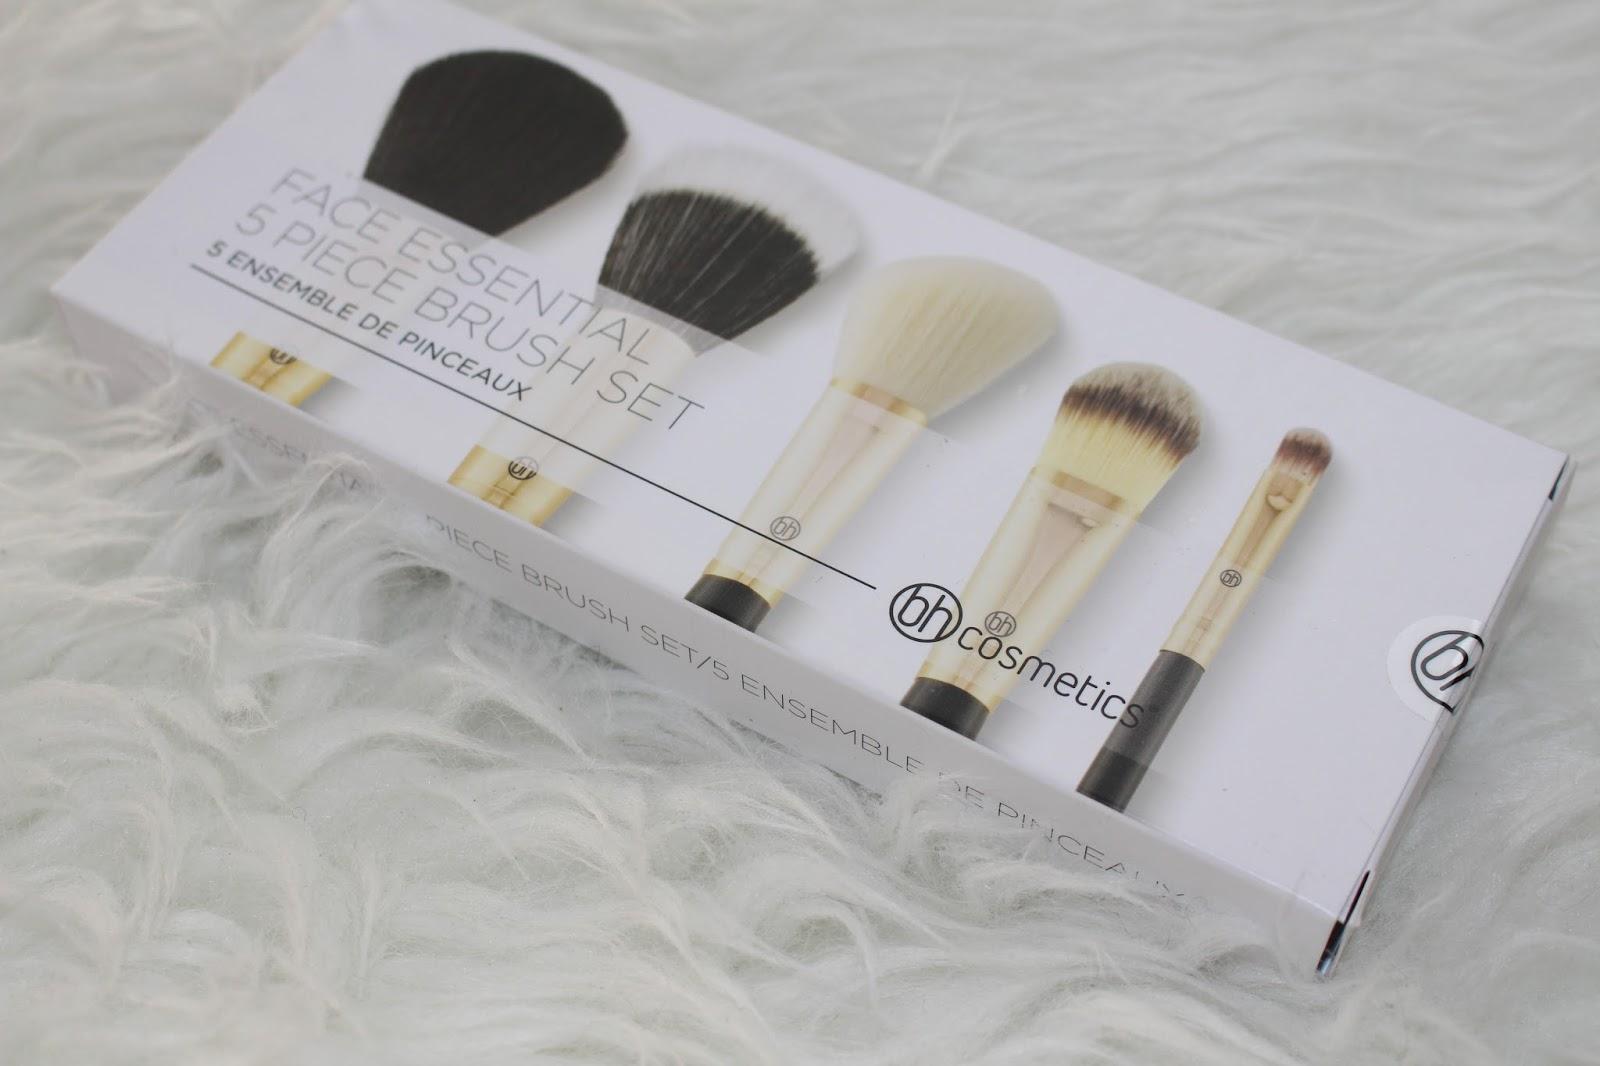 glow berlin haul bh cosmetics face essential 5 piece. Black Bedroom Furniture Sets. Home Design Ideas